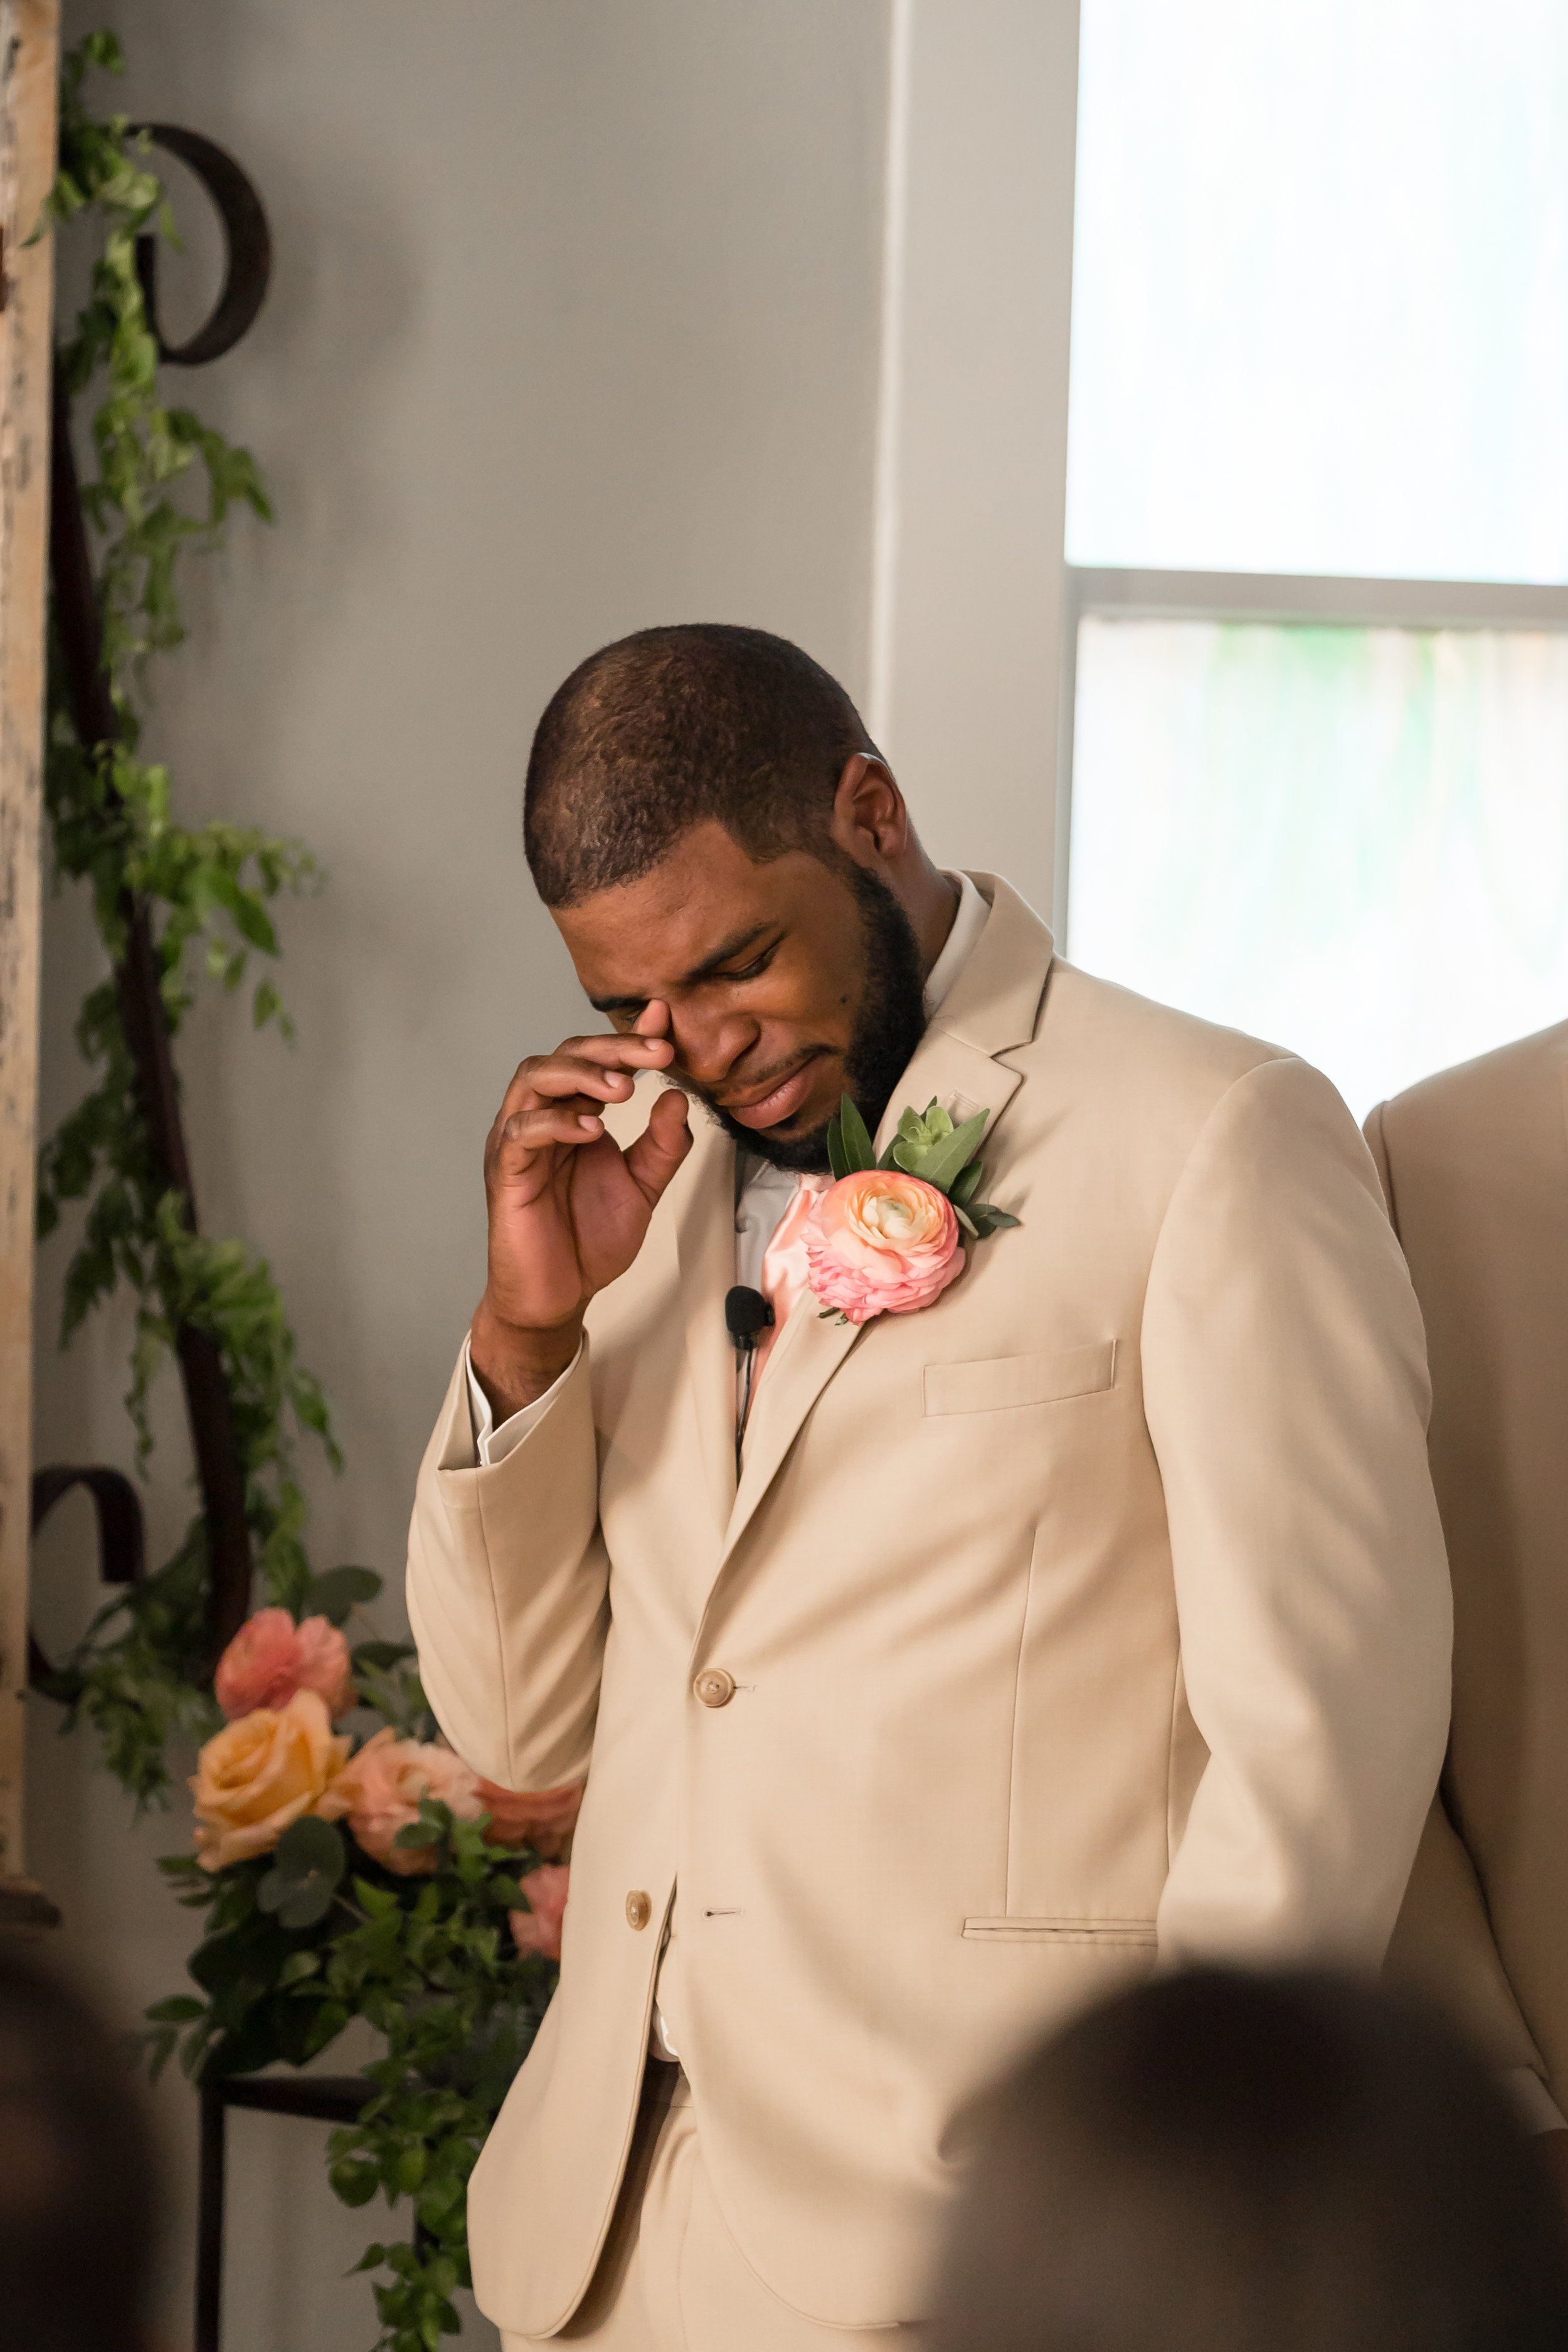 sarah_ikeem_wedding_at_the_parlour_at_manns_chapel_05.18.19-02389.jpg